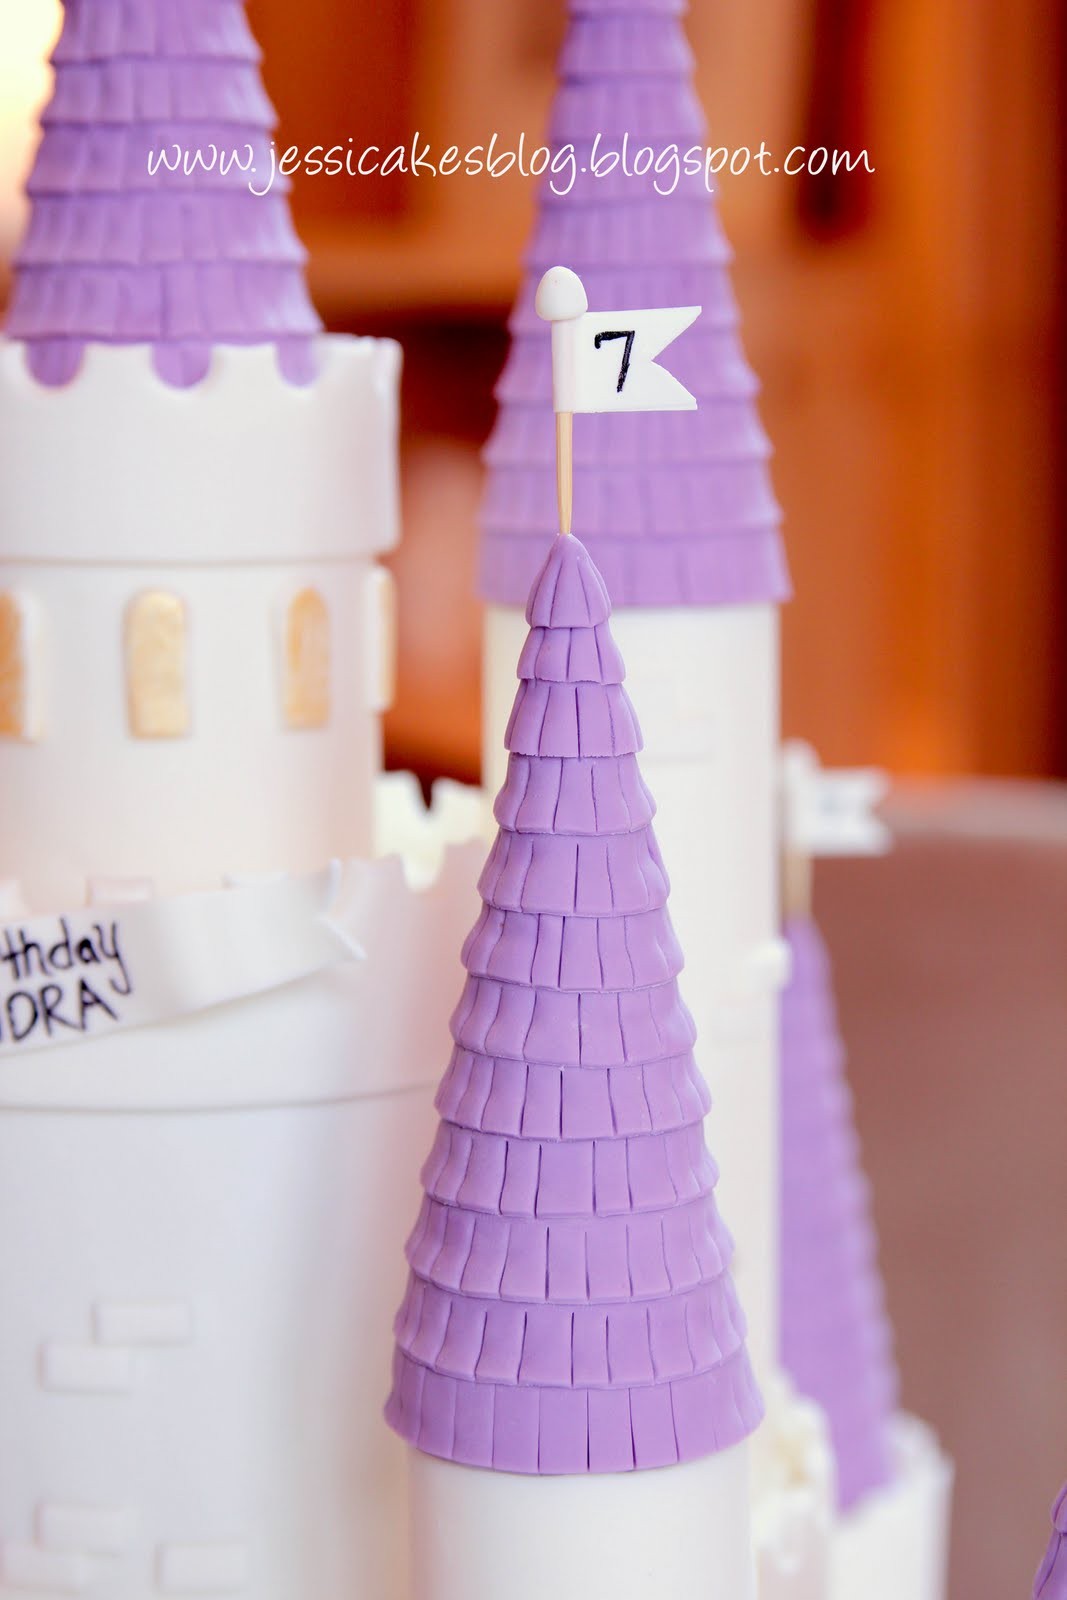 the castle cake - jessica harris cake design